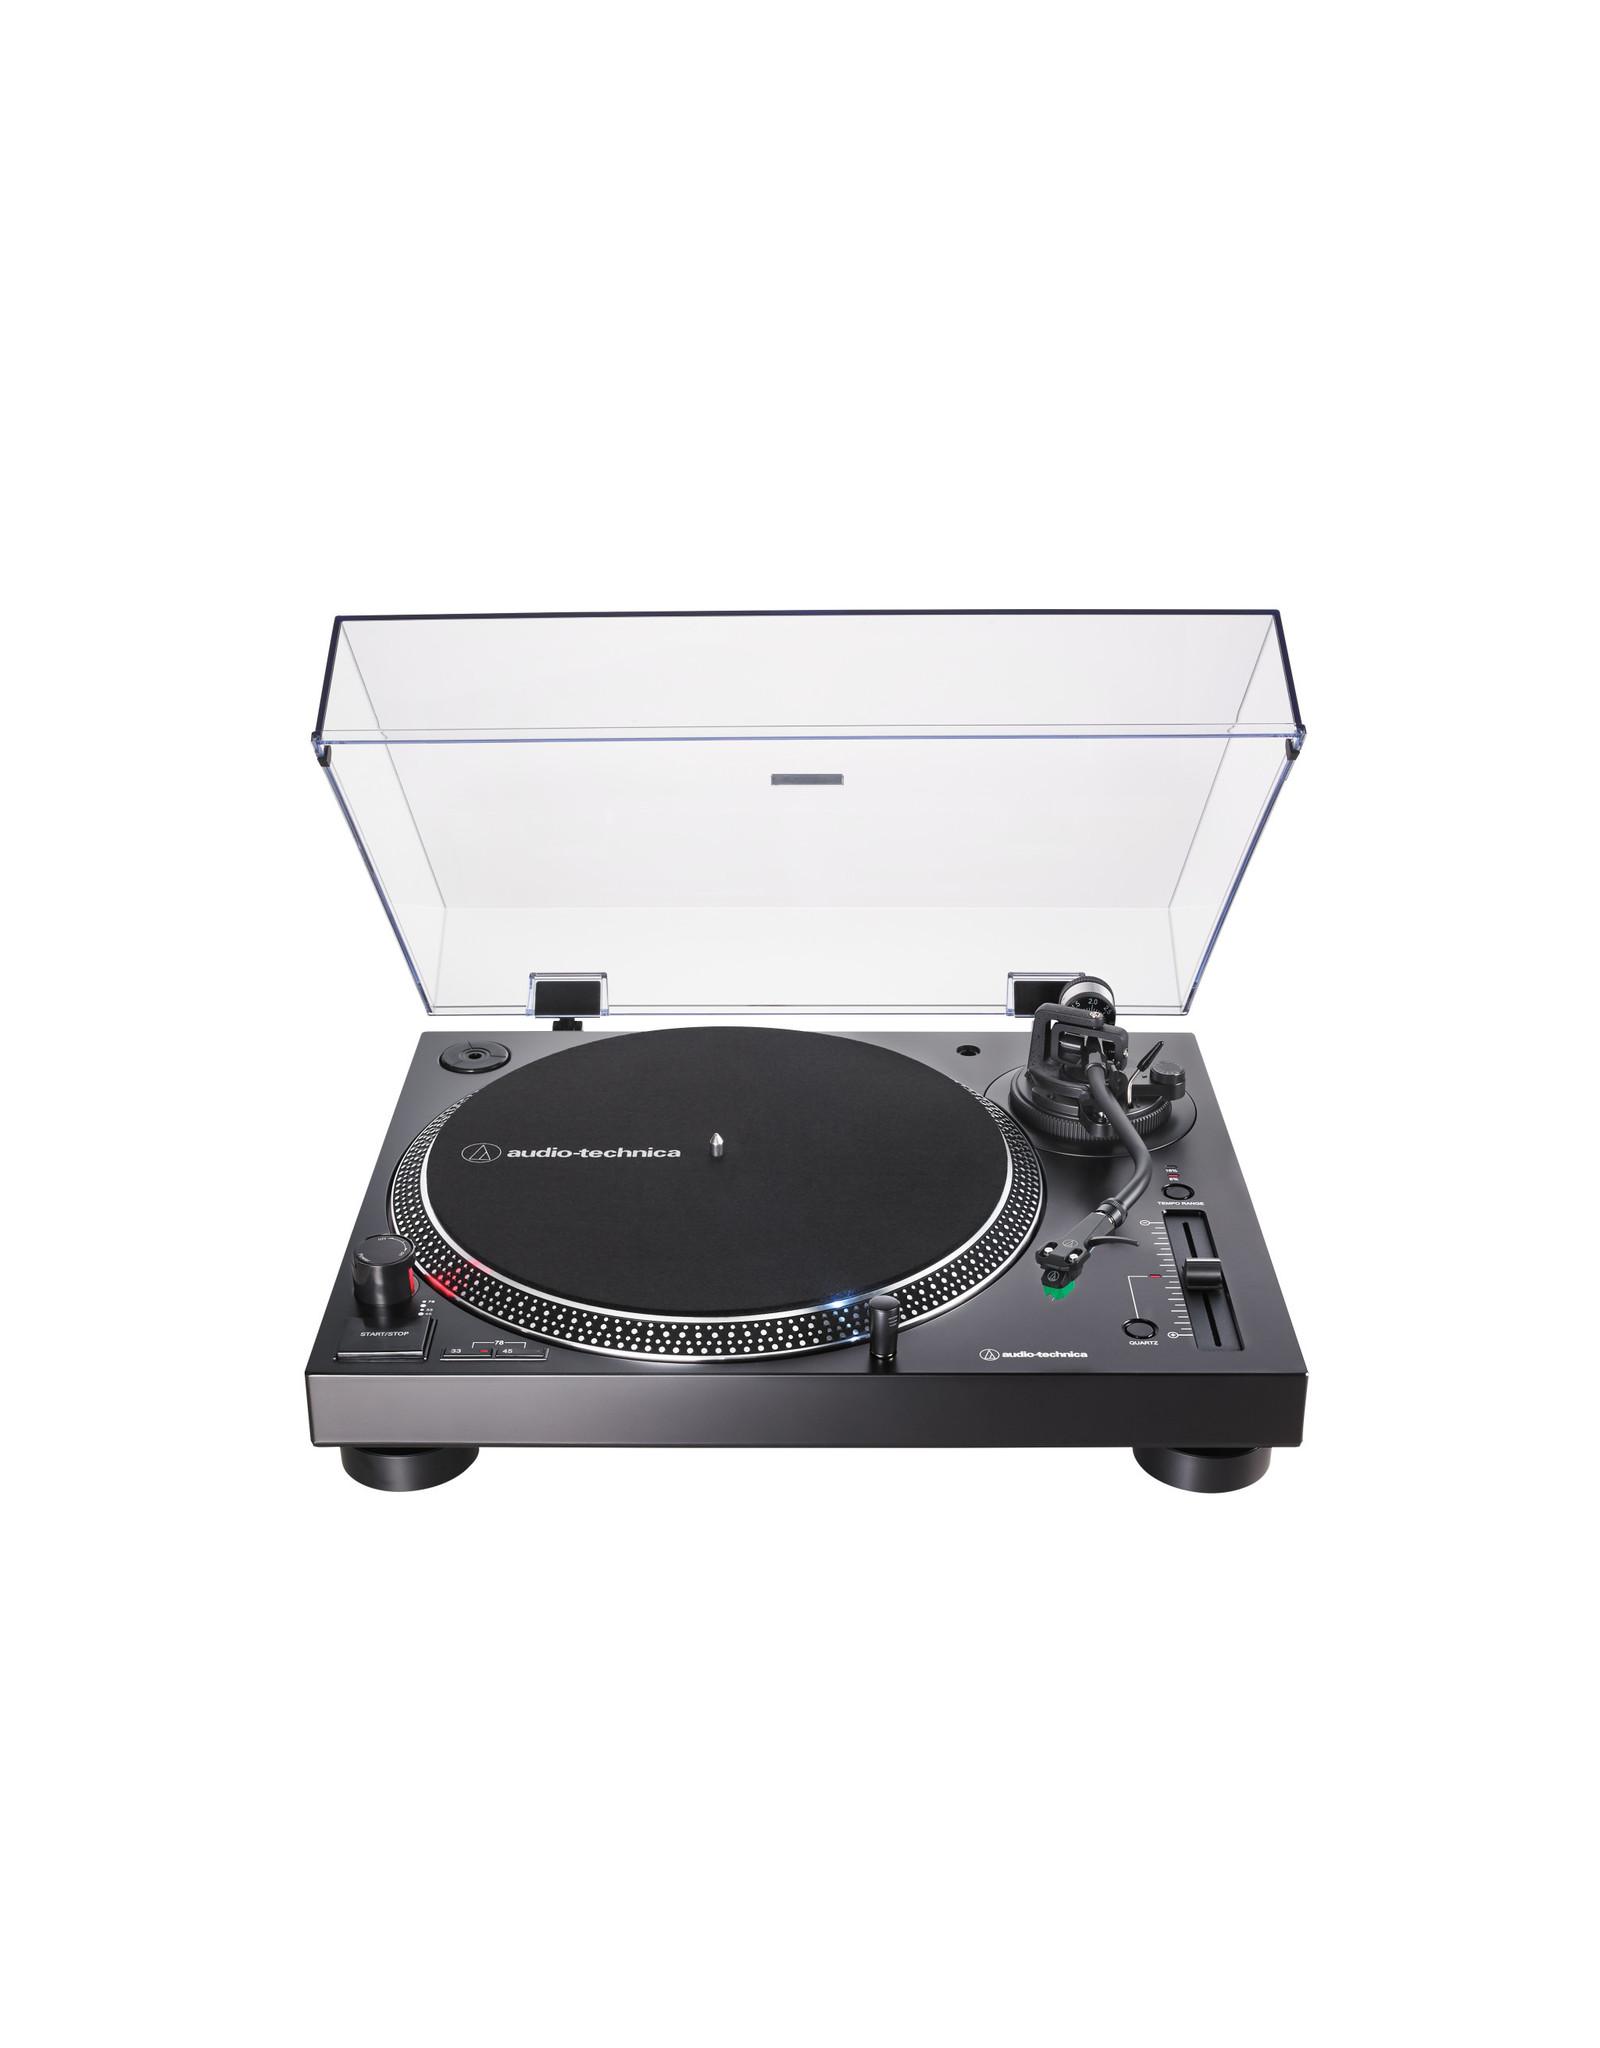 Audio-Technica Audio-Technica AT-LP120XUSB Turntable